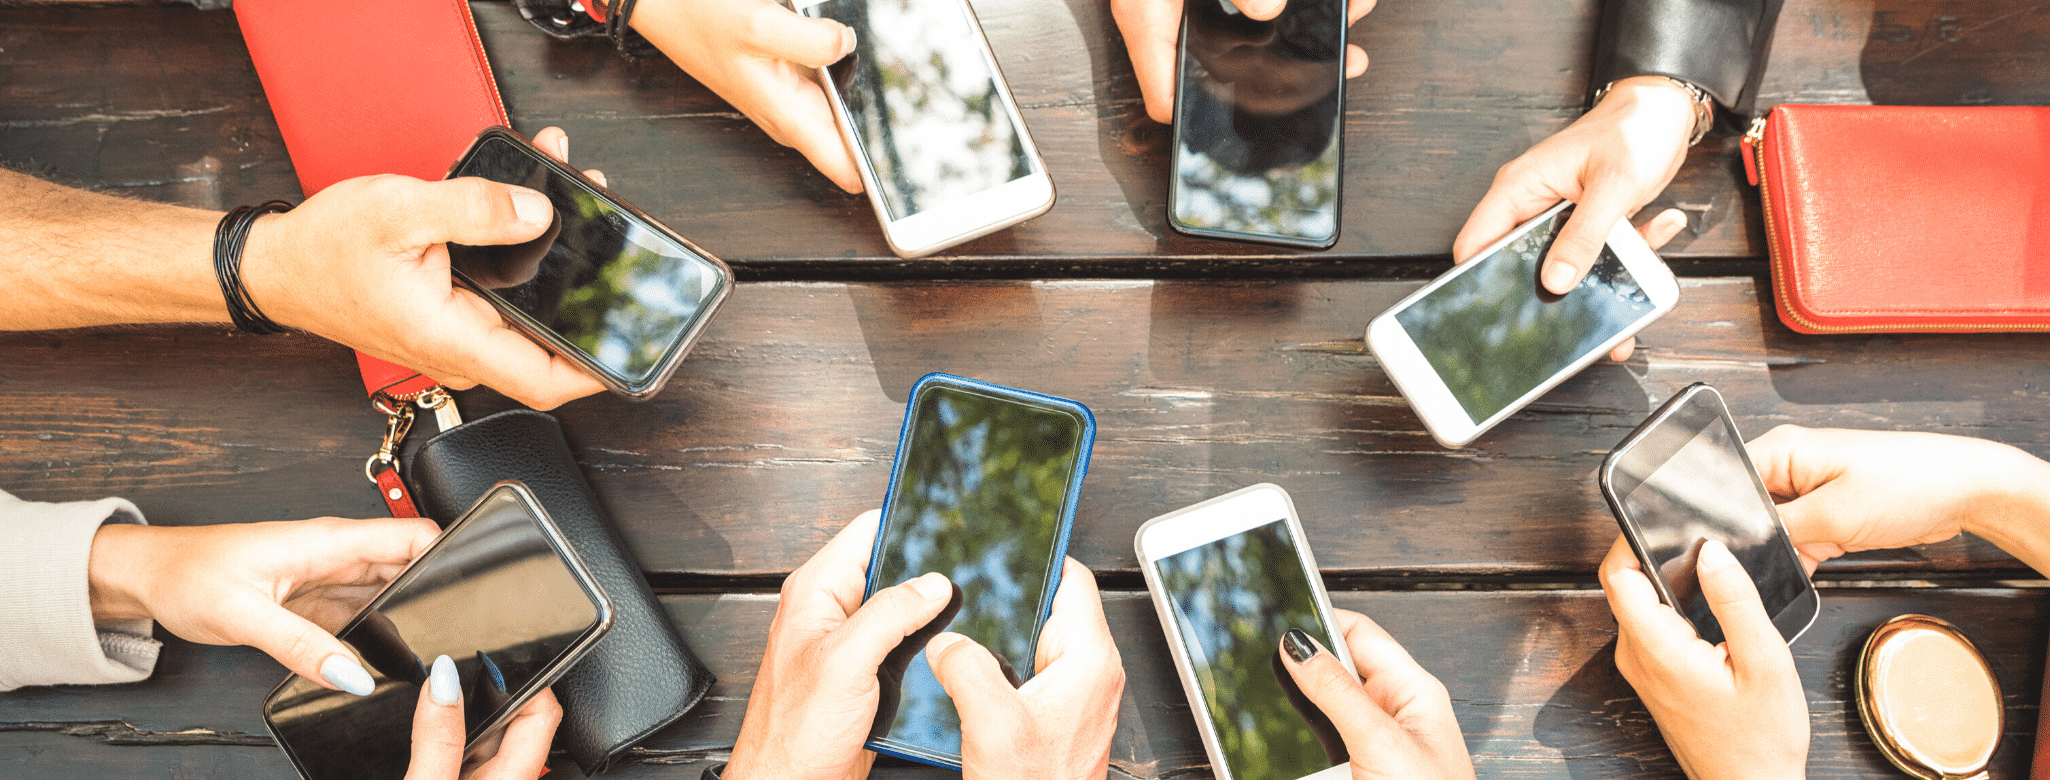 Digitale dementie, het gevaar van internetverslaving